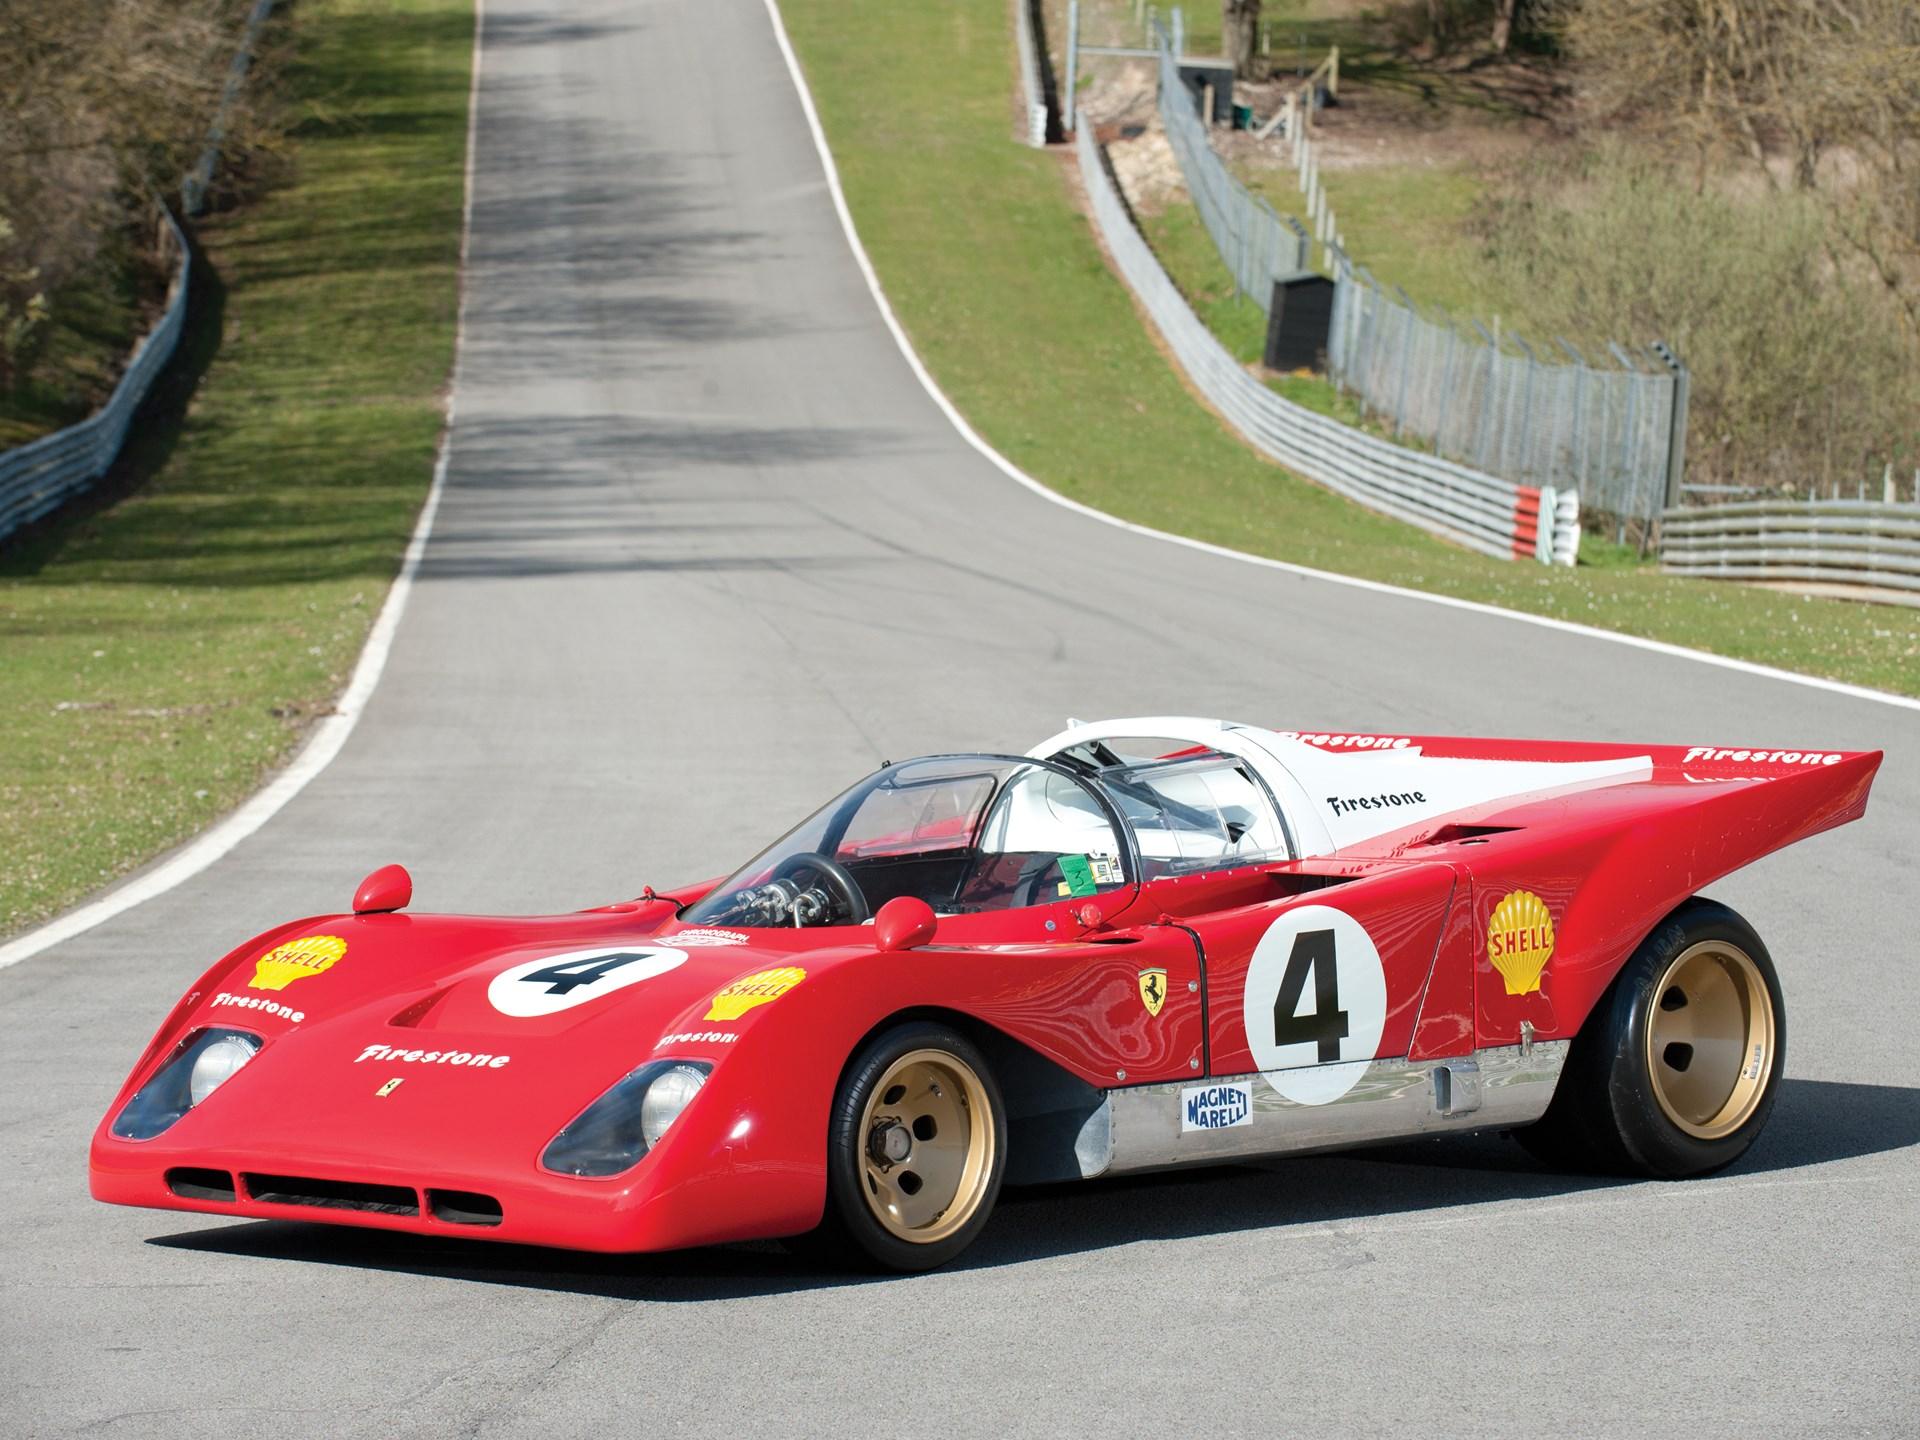 1967 Ferrari Dino 206 S Spider